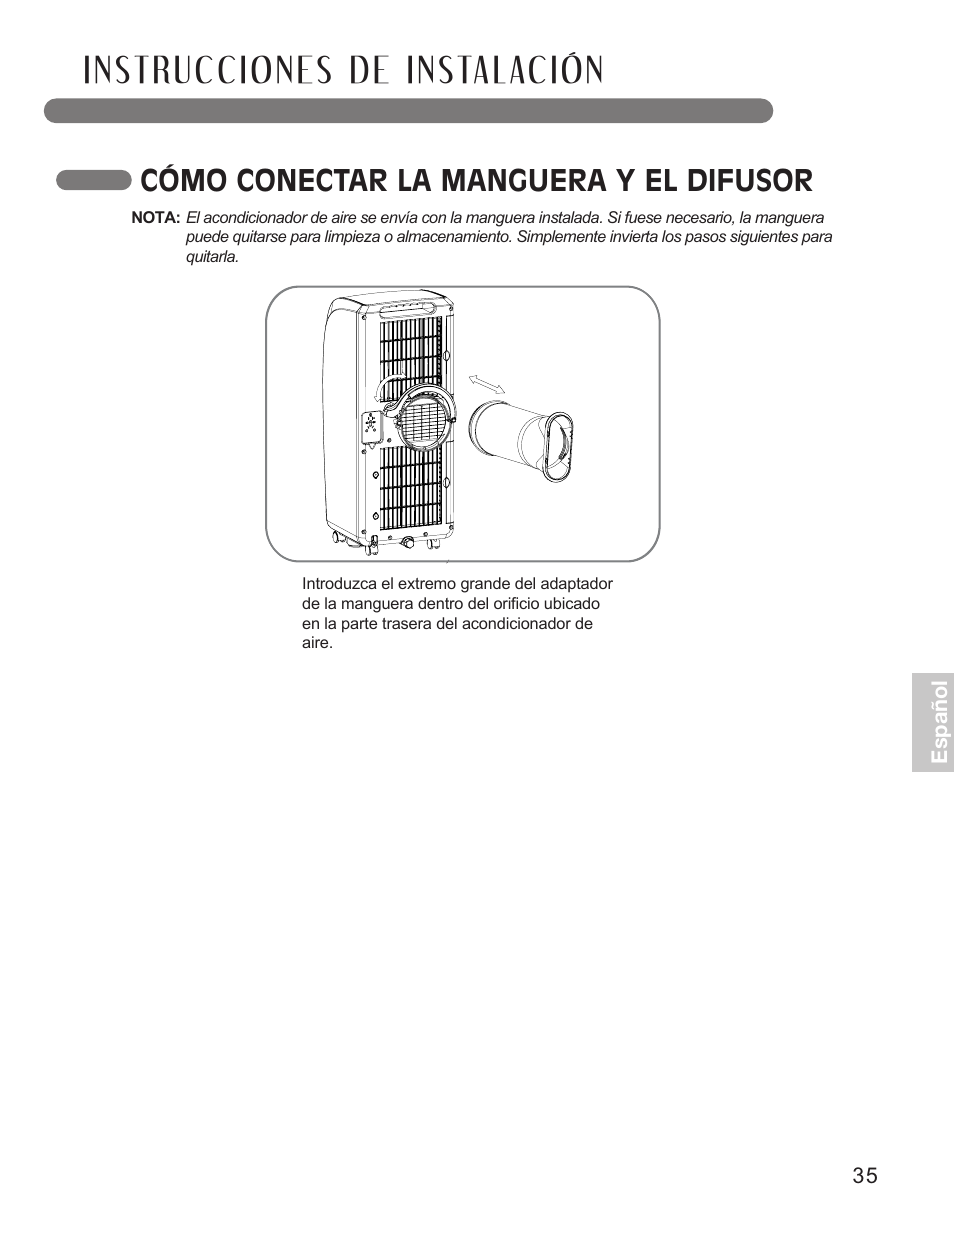 c mo conectar la manguera y el difusor lg lp0711wnr user manual rh manualsdir com User Manual User Manual